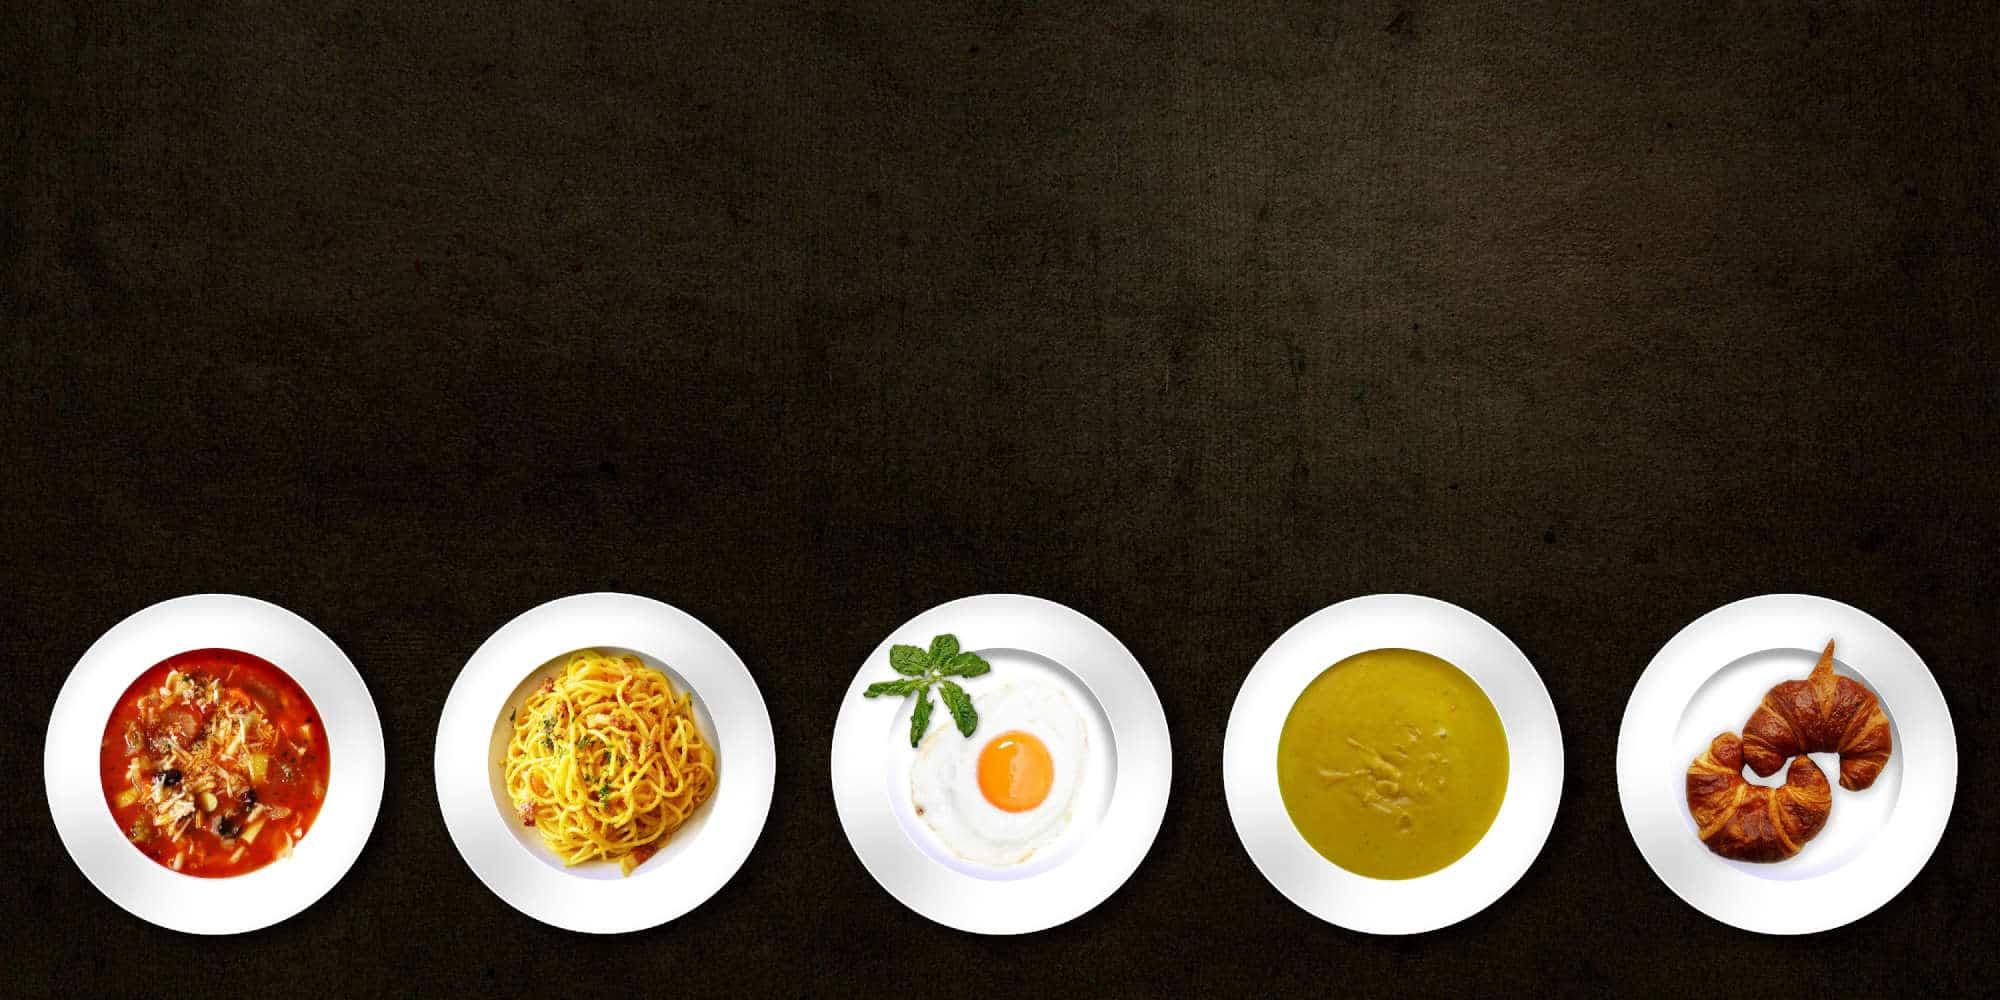 , TRUCCHI E STRATEGIE DEI RISTORATORI PER VENDERE DI PIÙ, Foodiestrip.blog